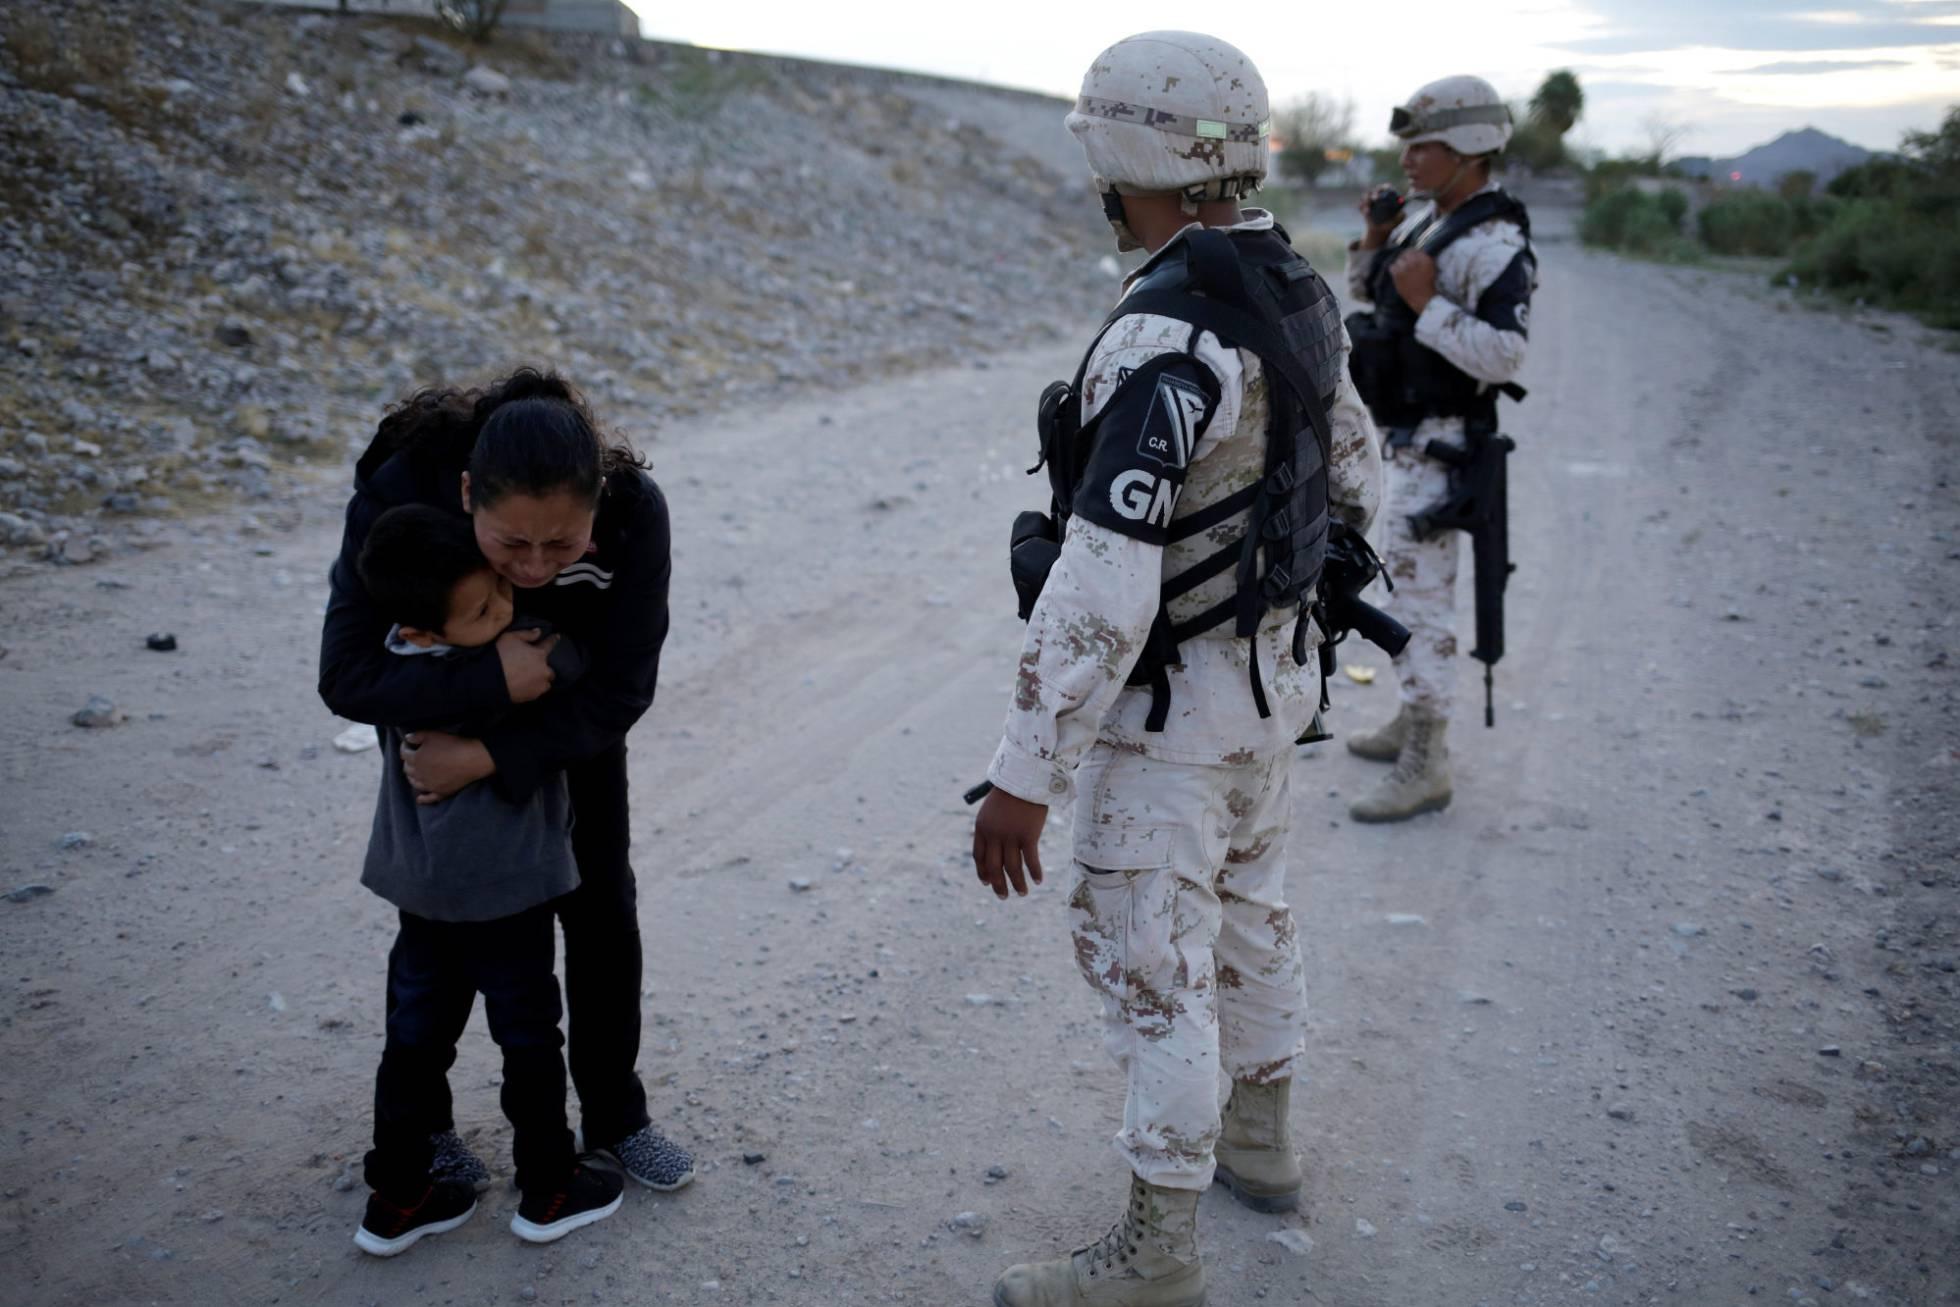 Trump amenaza a Guatemala con aranceles para que acepte más solicitantes de asilo